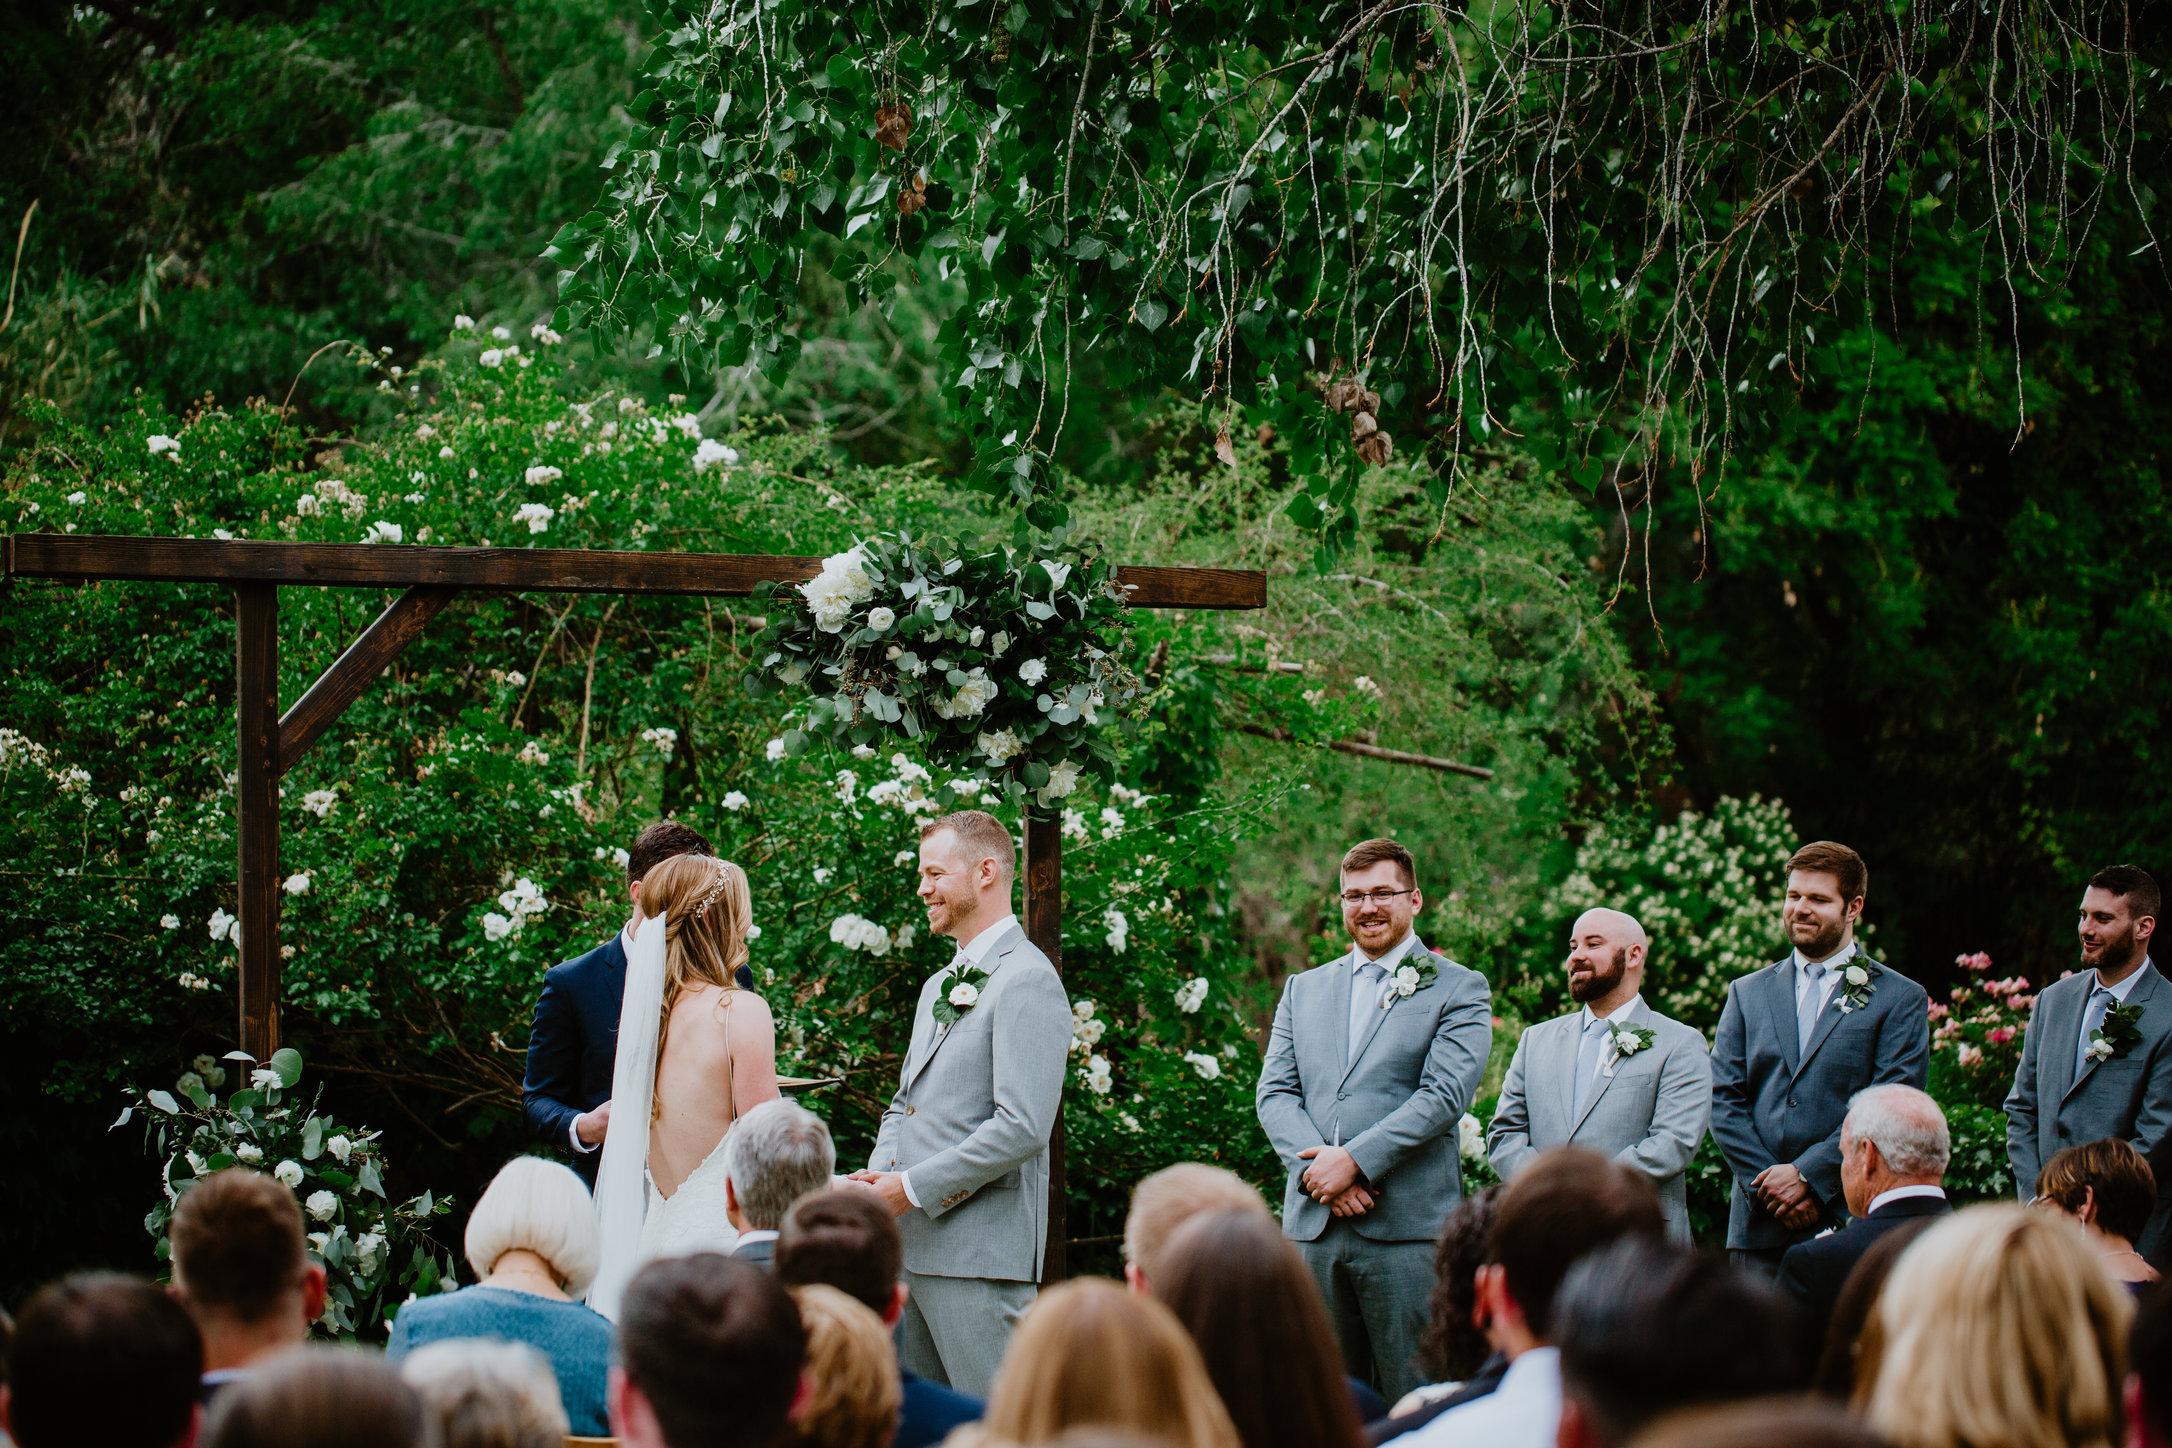 DandA-wedding-255.jpg